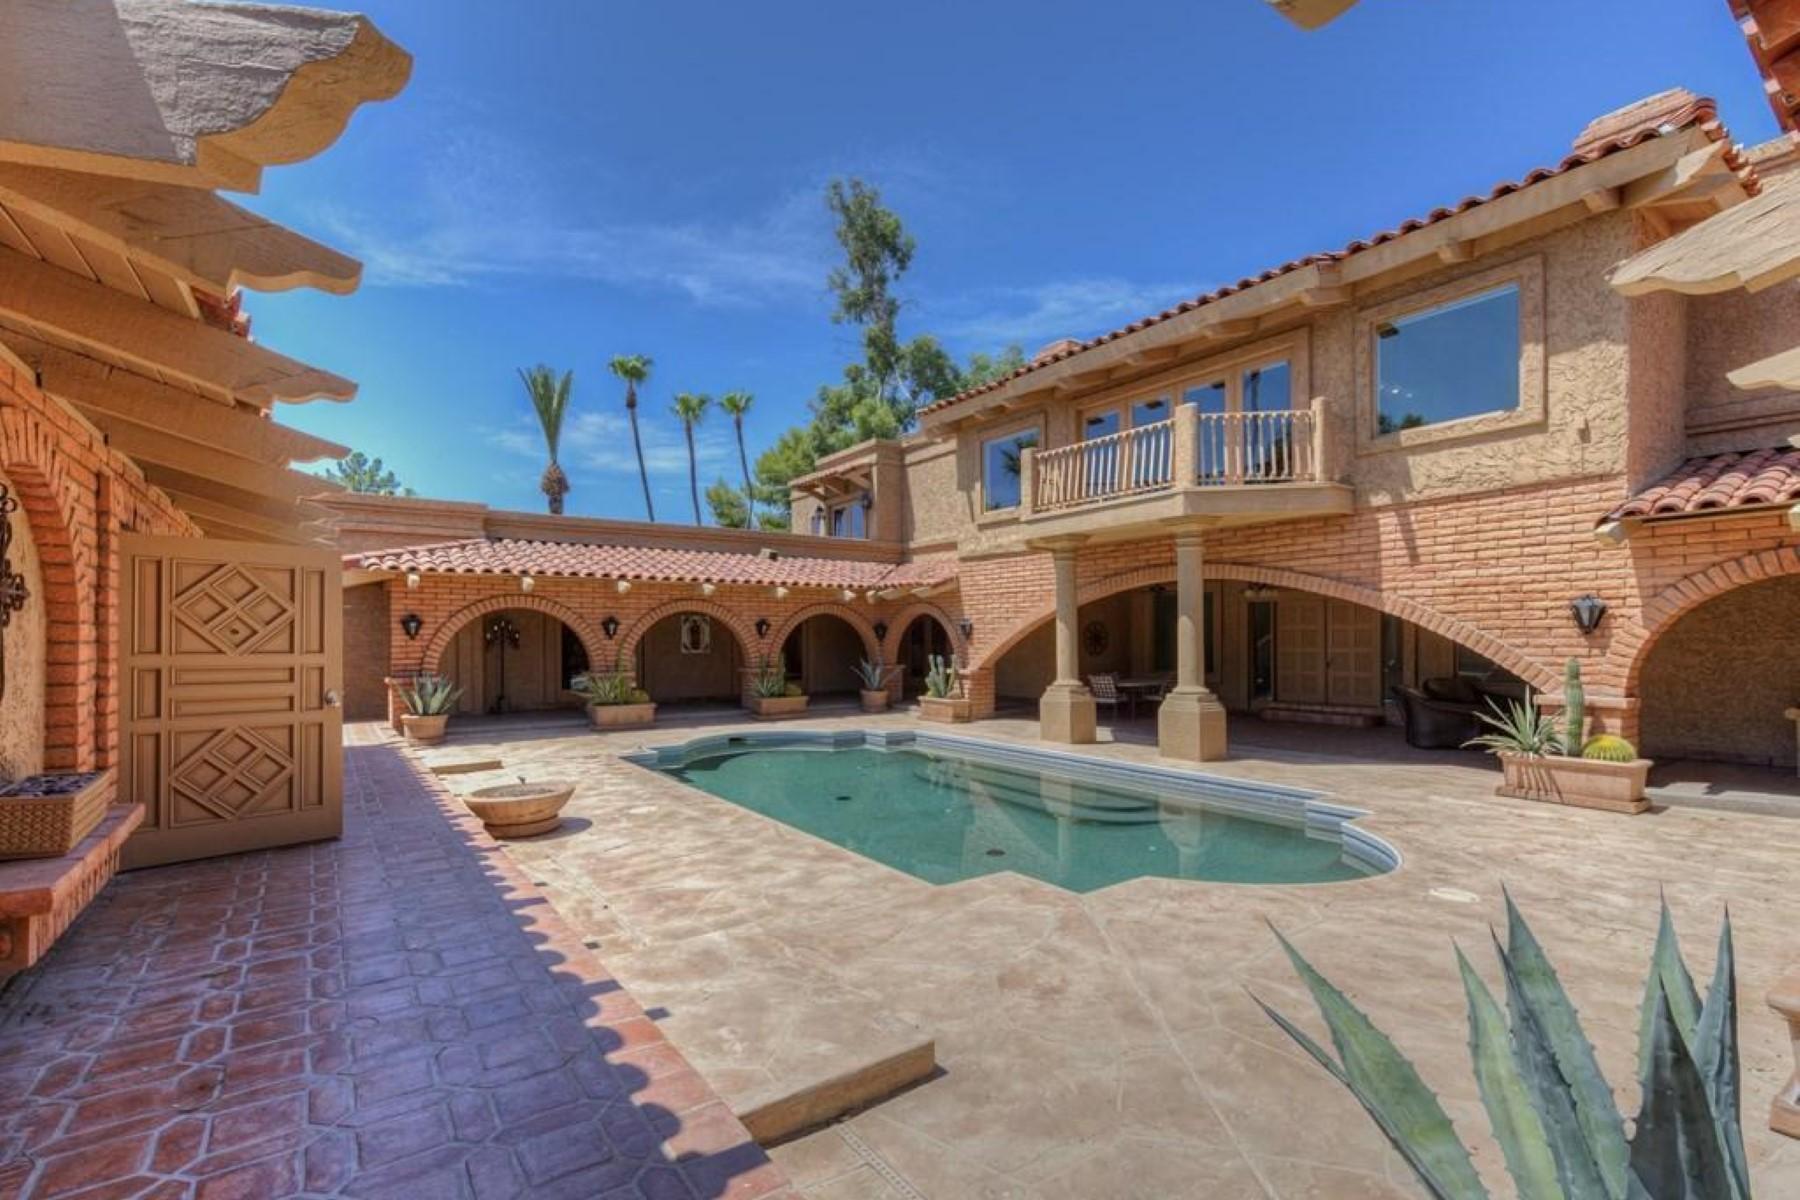 Villa per Vendita alle ore Easy living in the much sought after Camelback Country Club Estates neighborhood 7155 E OAKMONT DR Paradise Valley, Arizona 85253 Stati Uniti